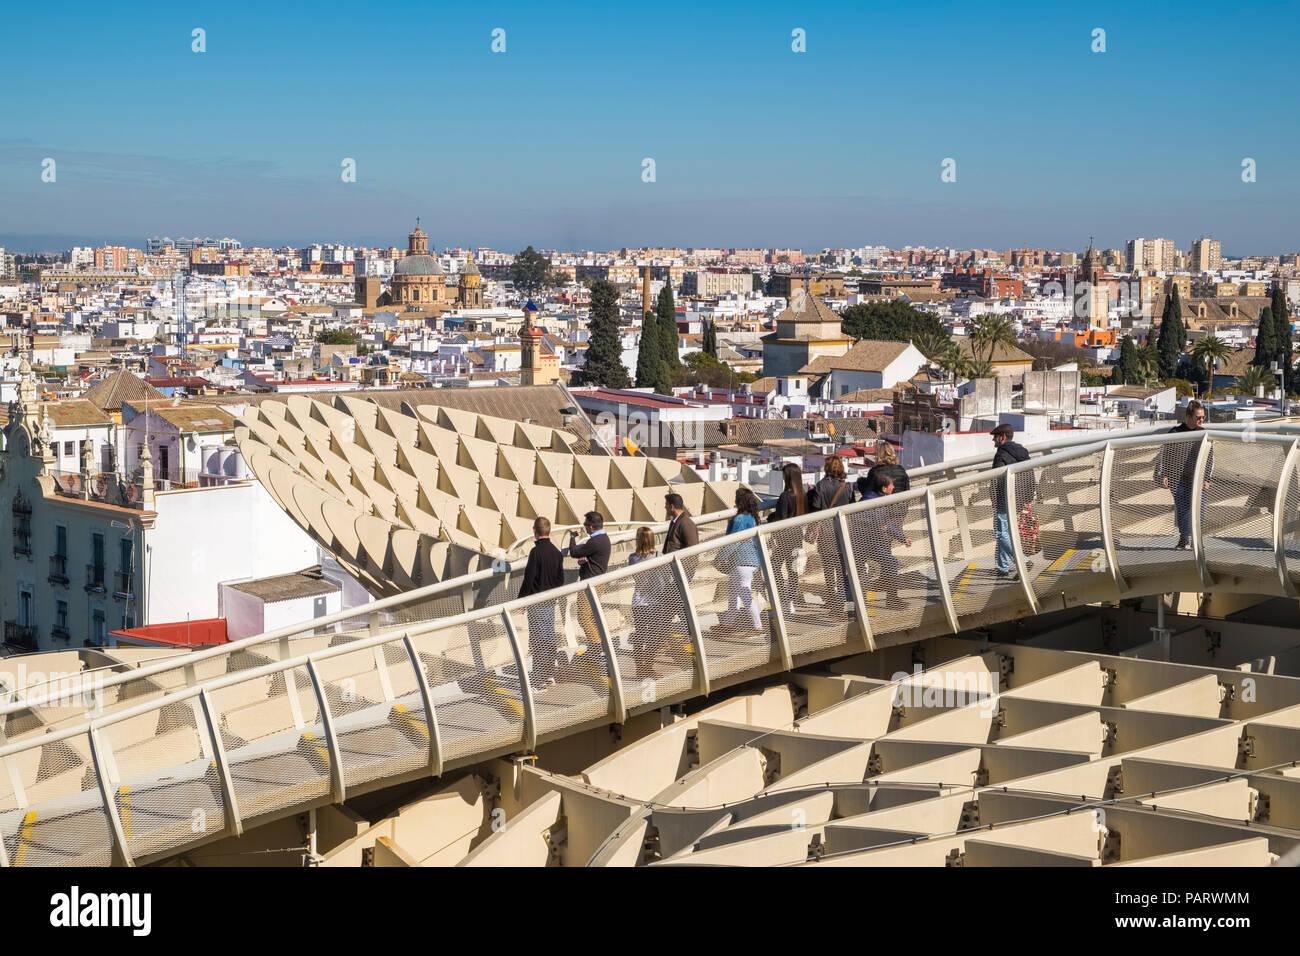 Metropol Parasol, Espacio Metropol Parasol, Incarnation Square, Plaza de la Encarnation with views over Seville, Spain, Europe - Stock Image